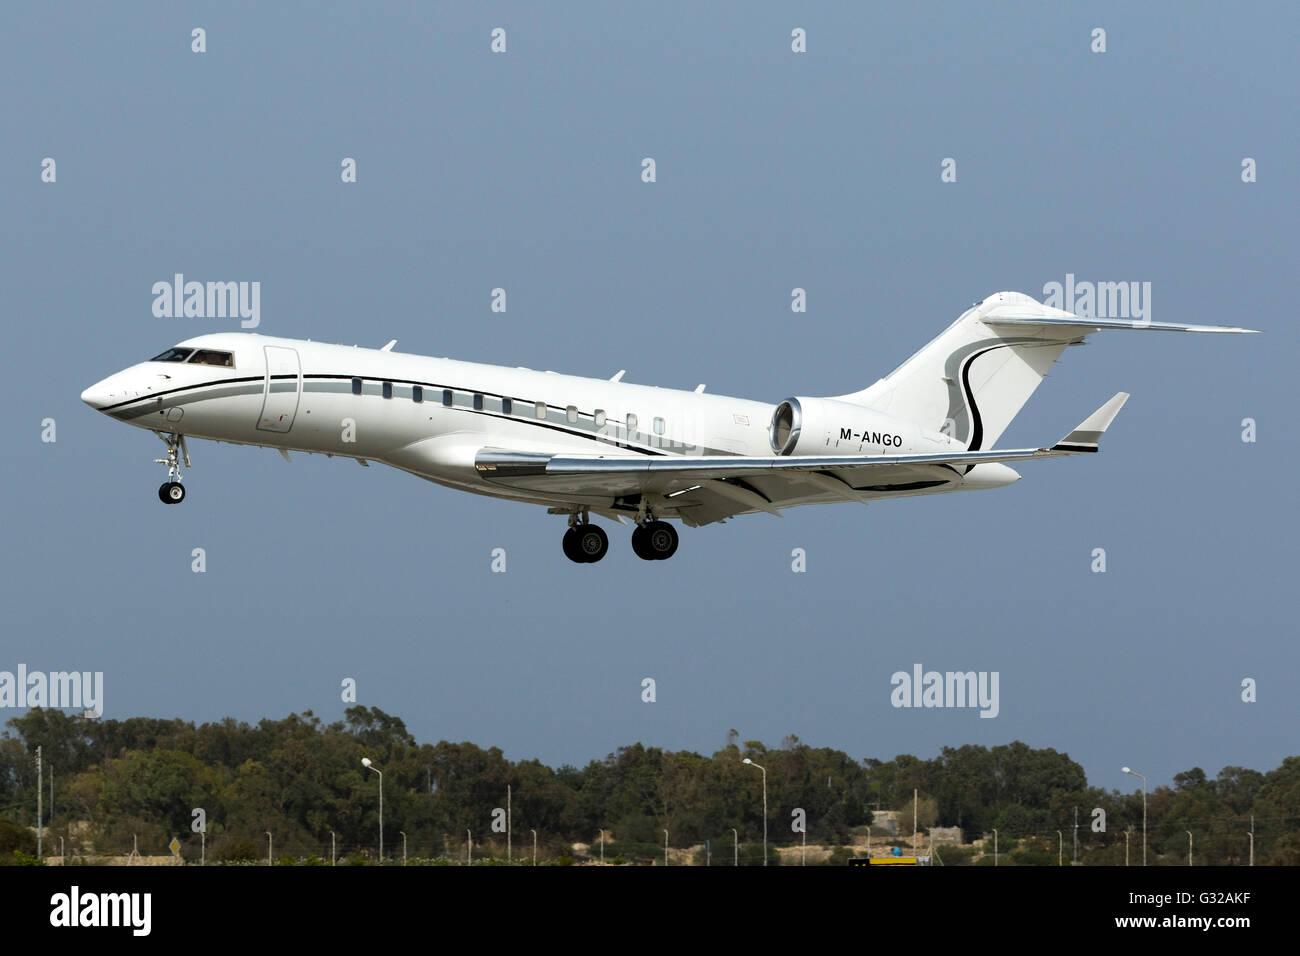 Bombardier Global 5000 (BD-700-1A11) [M-ANGO] landing runway 31. - Stock Image